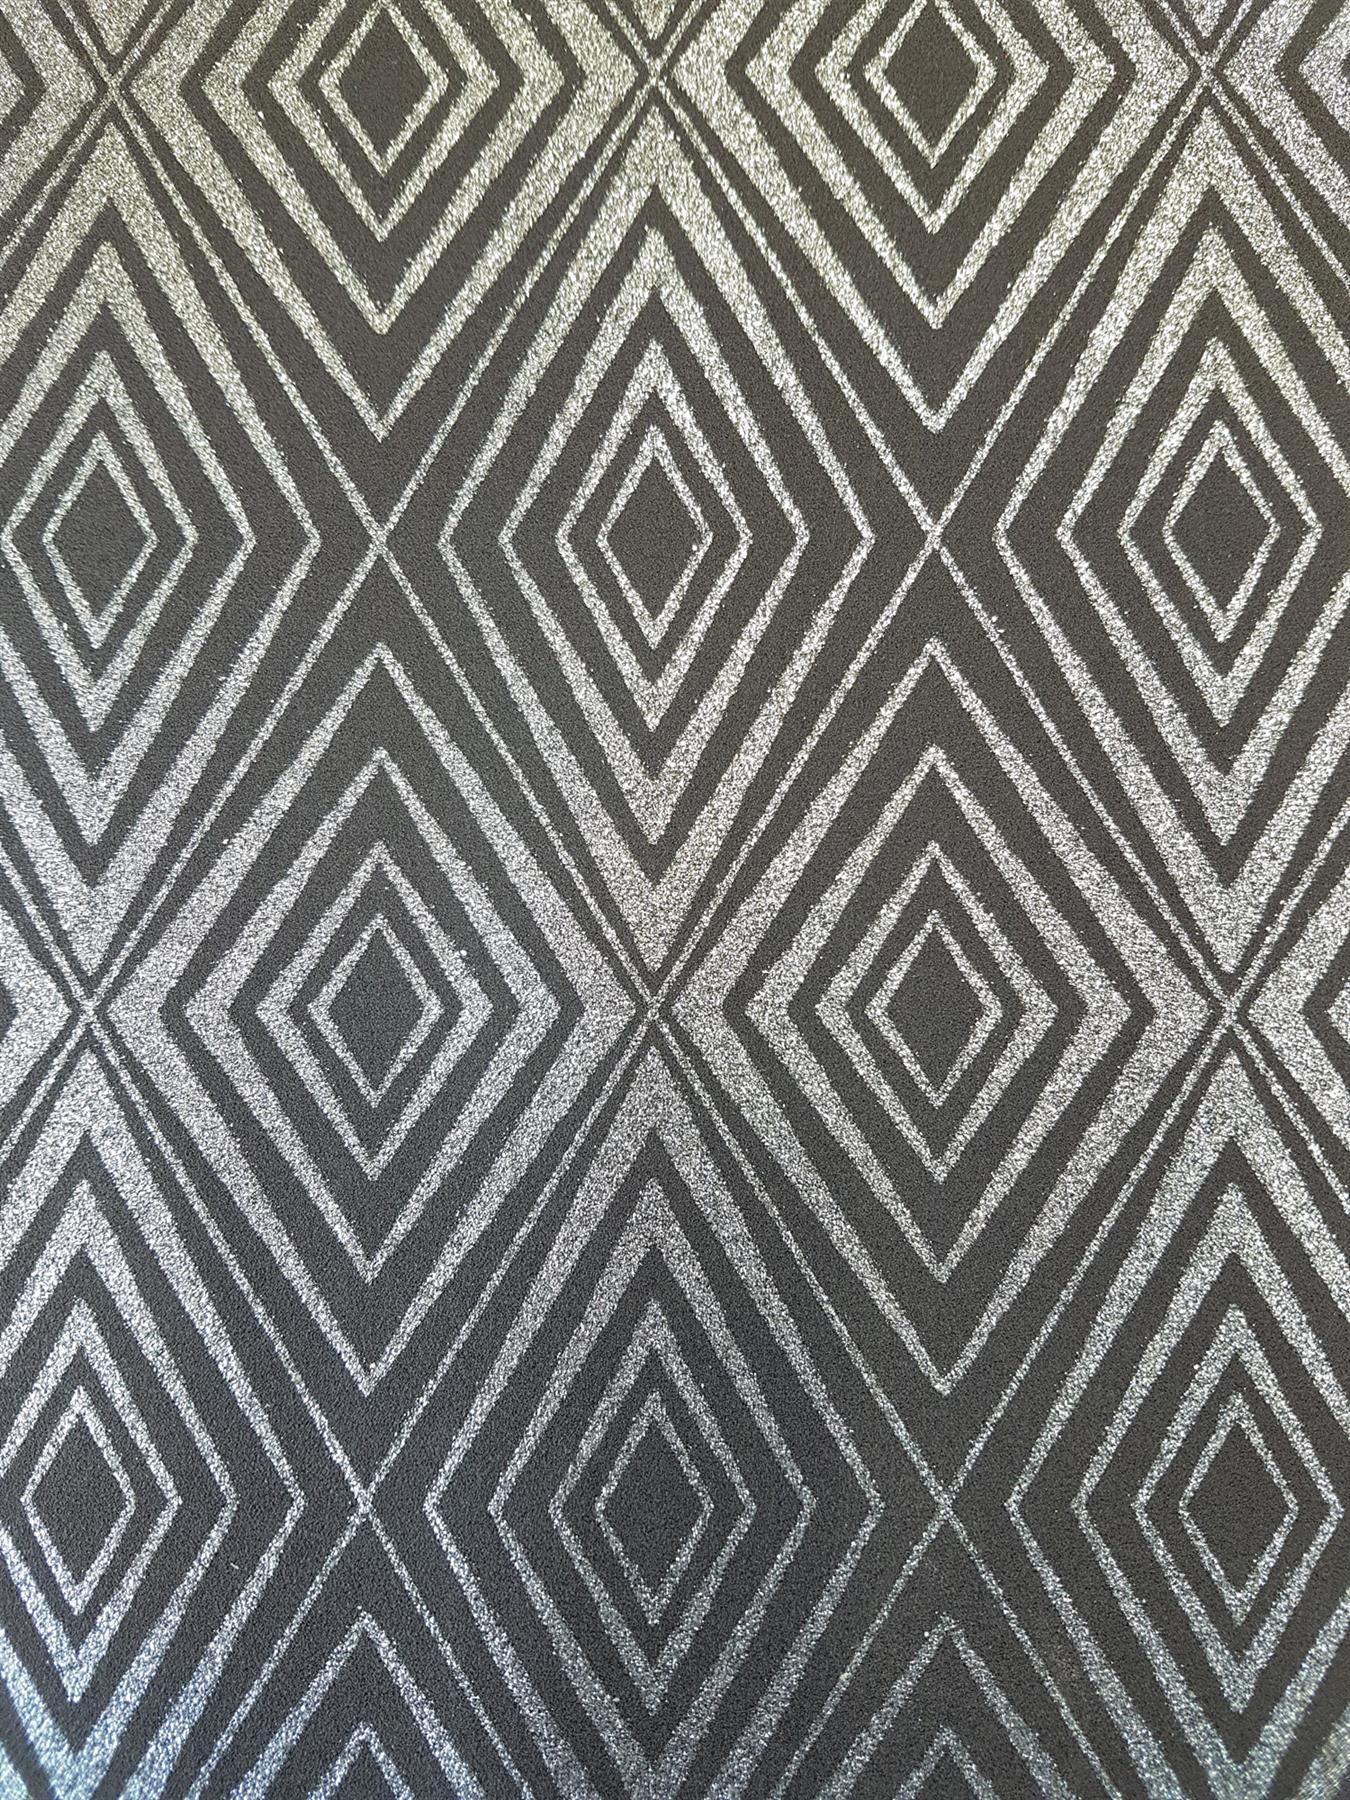 P S Diamond Black Silver Geometric Glitter Wallpaper Shimmer